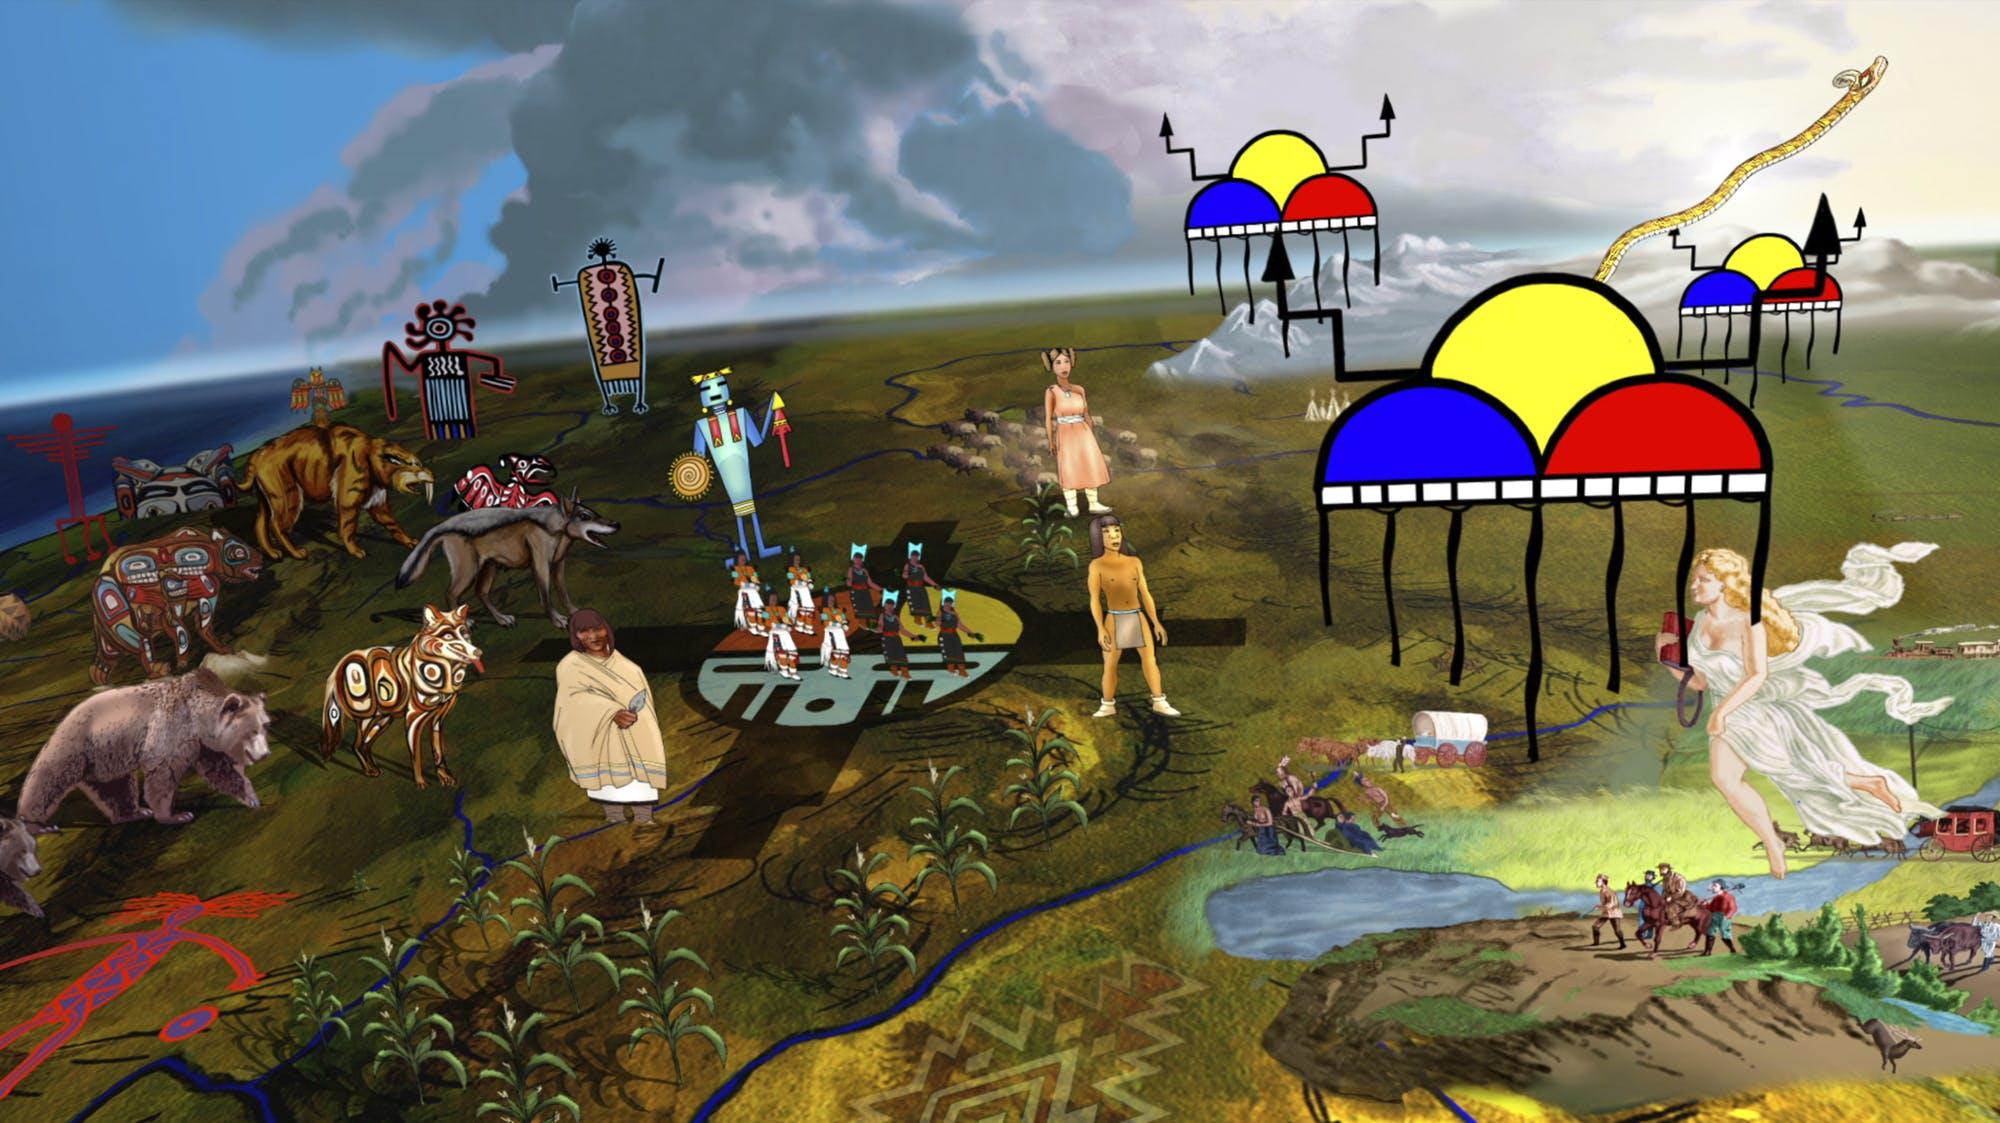 John Jota Leaños. American (Xicano-Mestizo), born 1969. Destinies Manifest, 2017. Digital animation, installation, 7 minutes. Provided by the John Jota Leaños. Photos: Blue Rain Gallery, Santa Fe, NM.